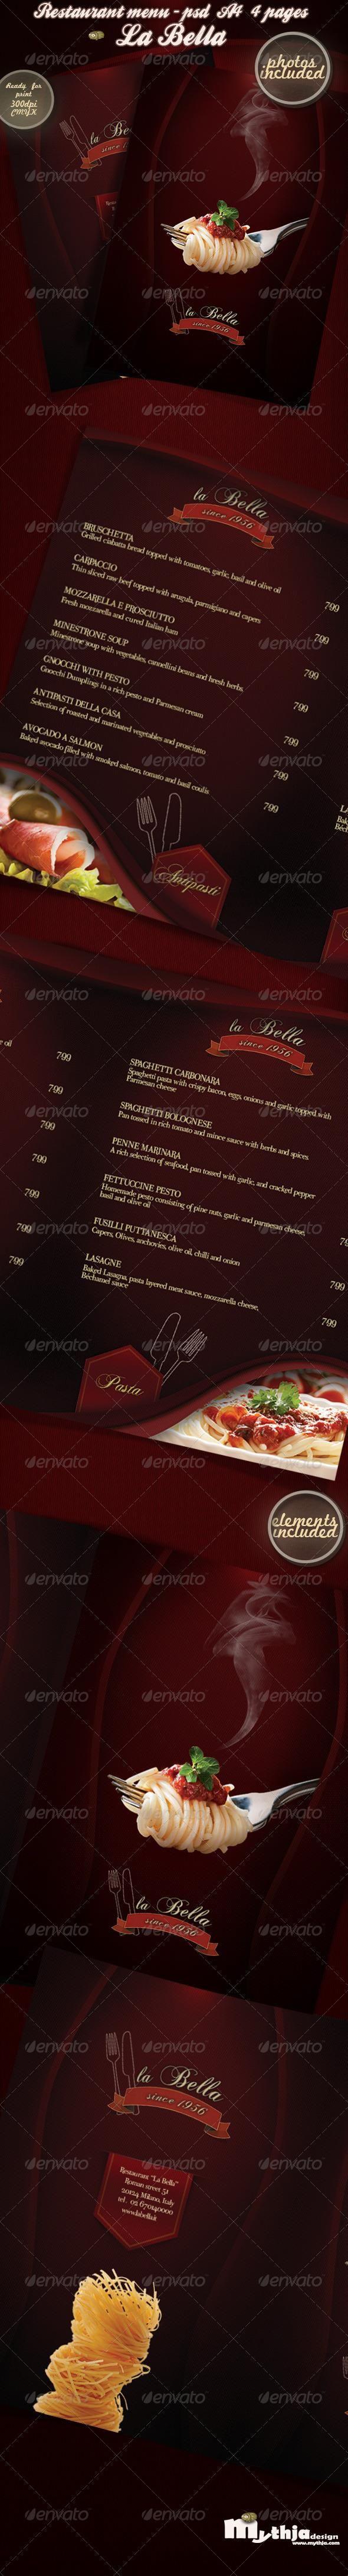 La Bella Restaurant Menu Photos